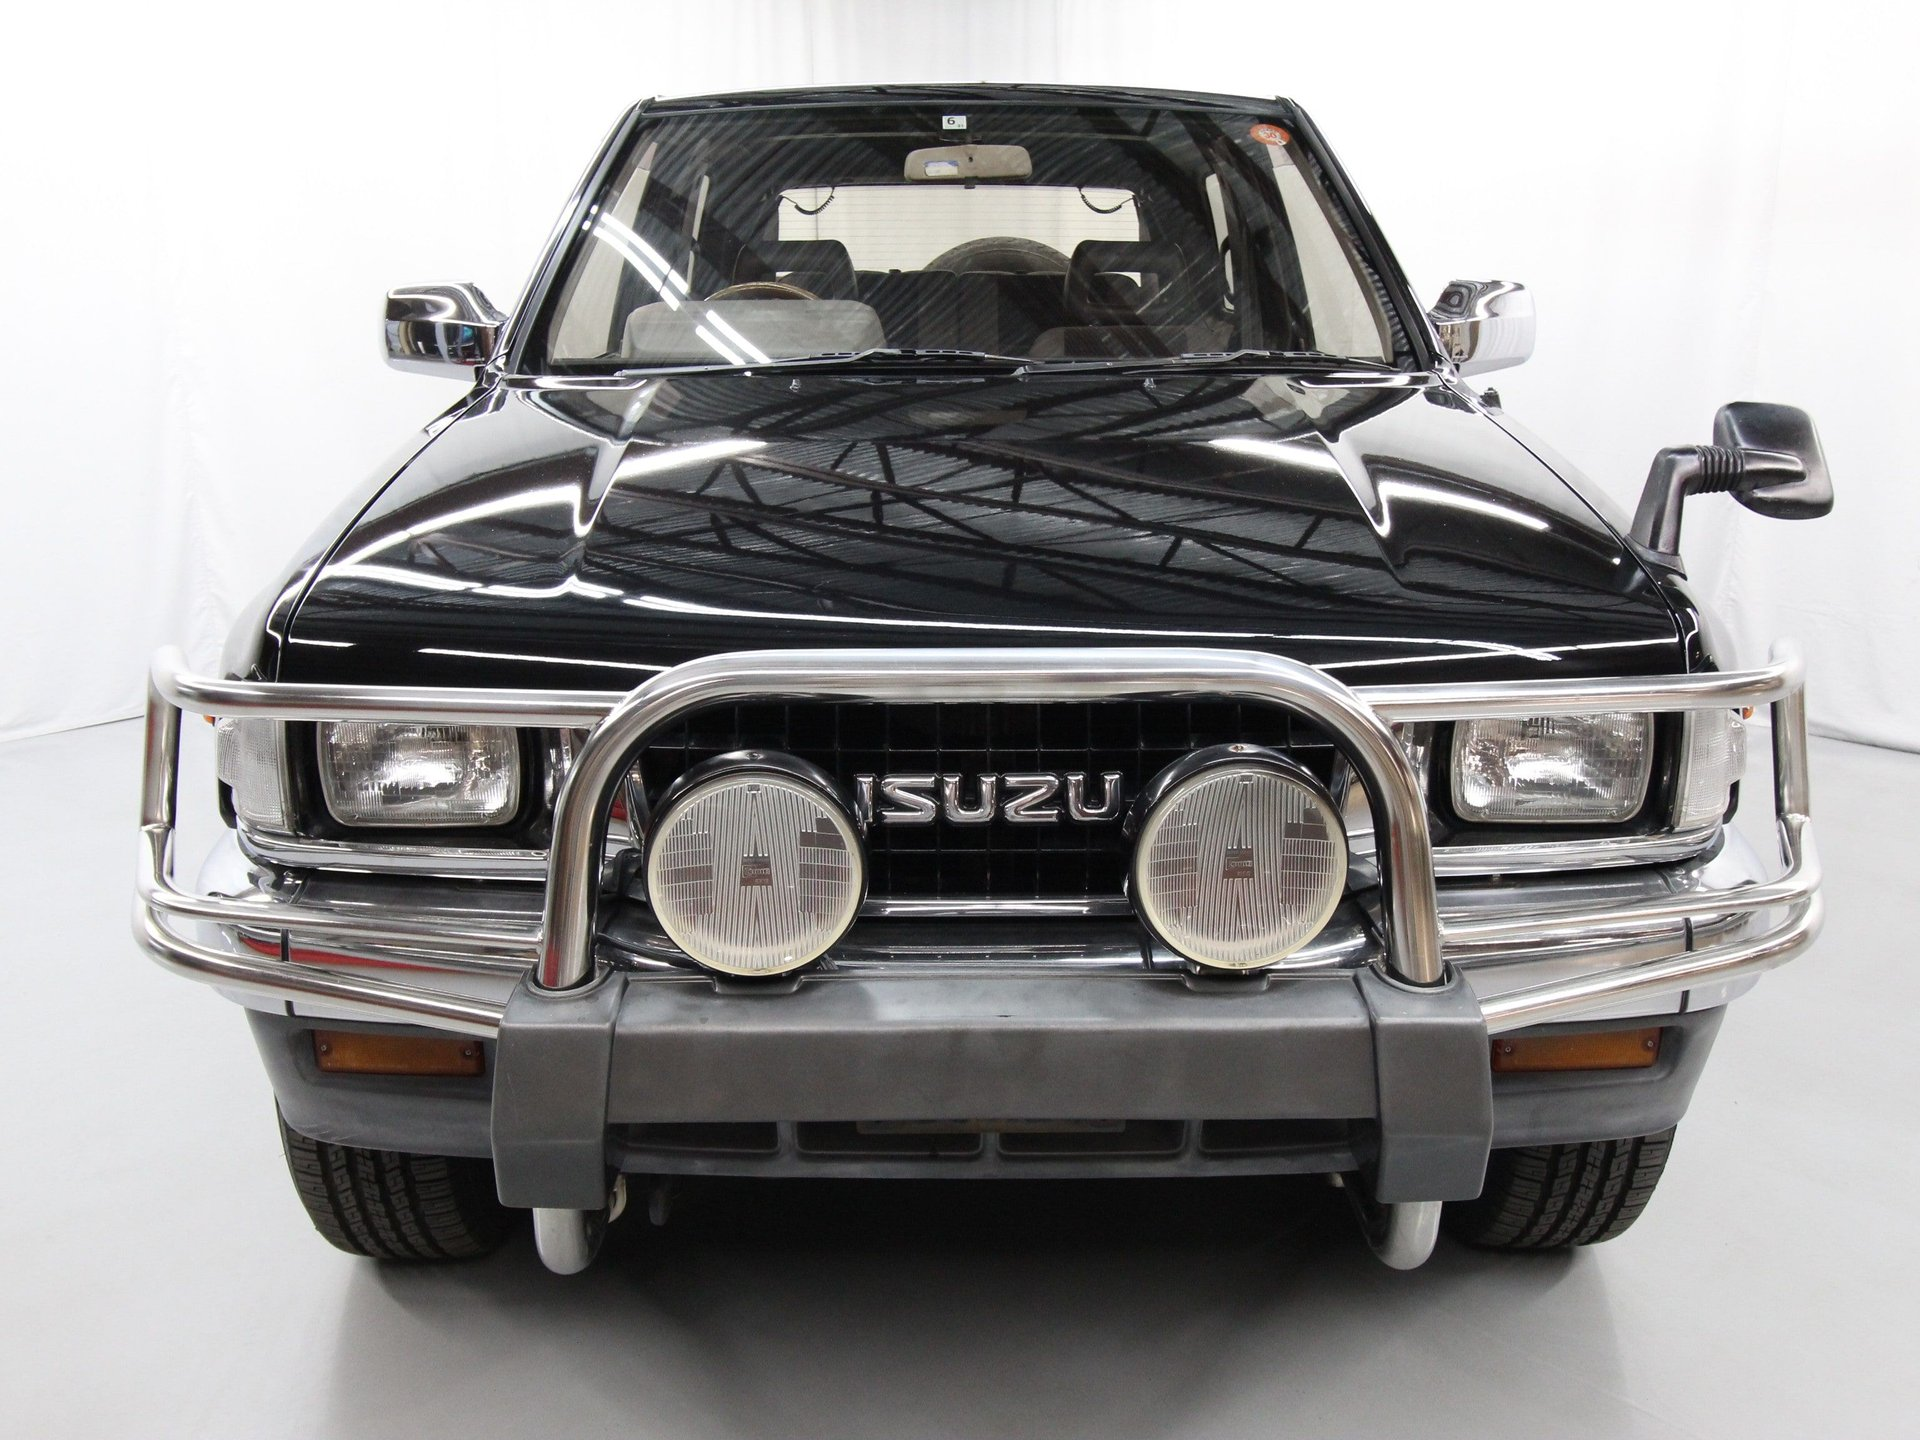 1994 Isuzu Mu